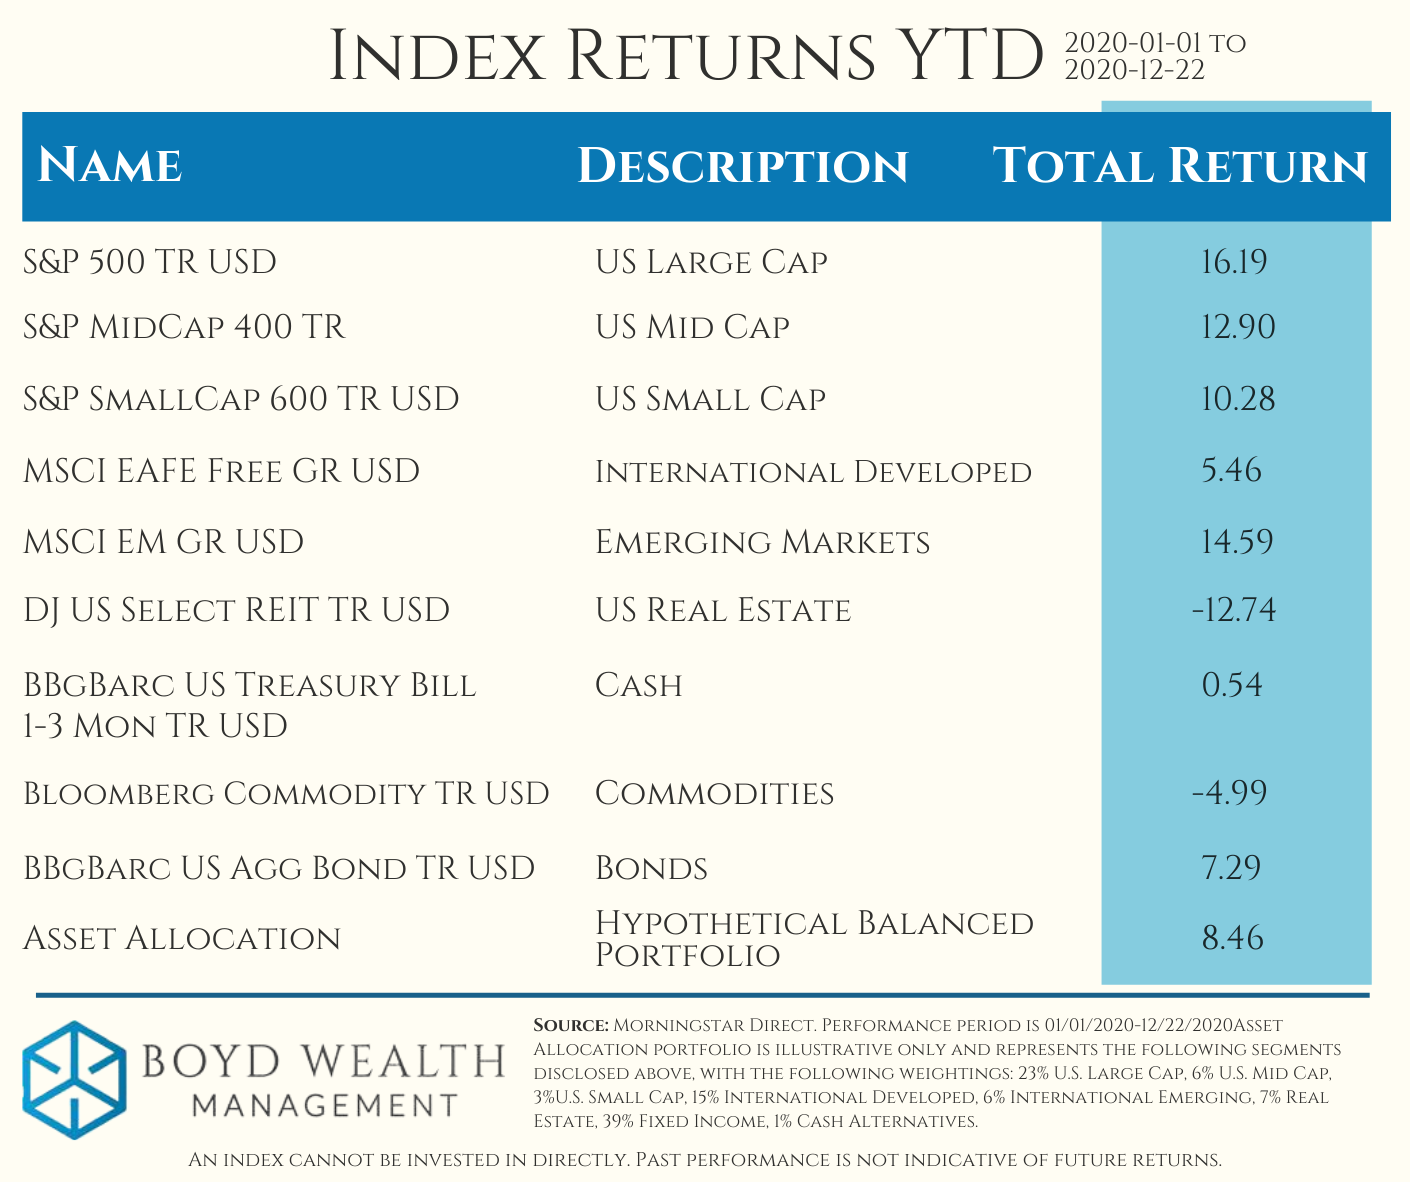 2020 Index Returns YTD